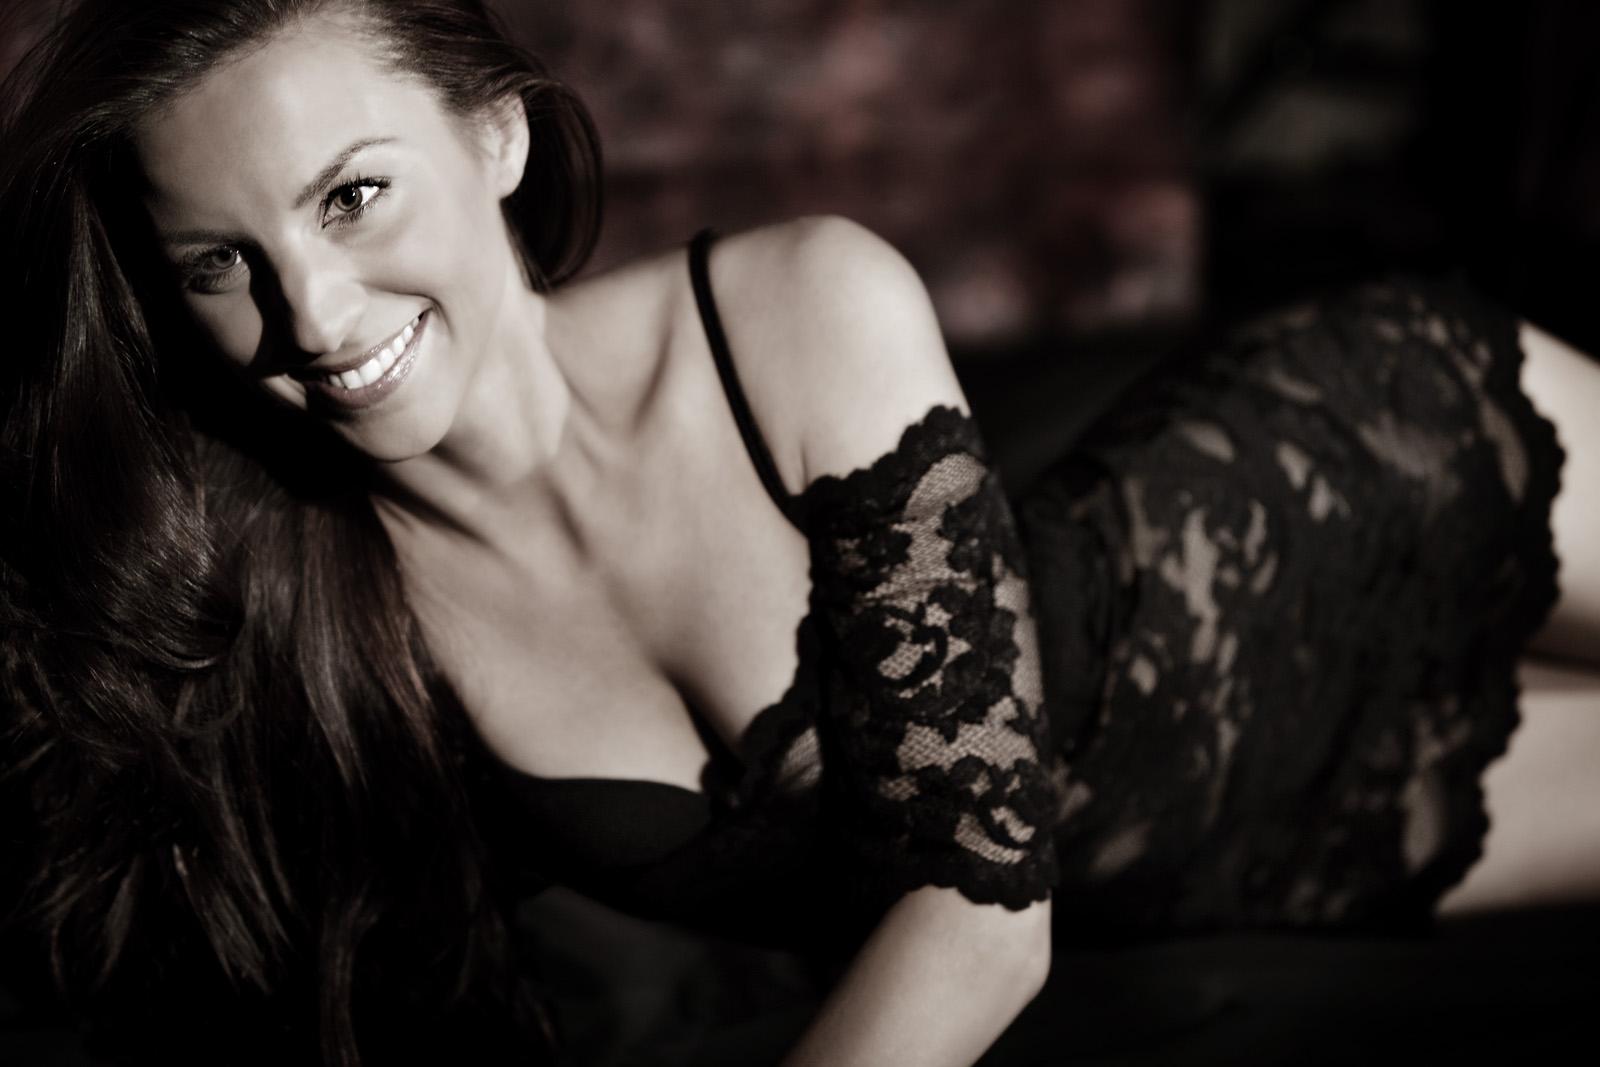 corsentino-m-toppro-gallery-2012-05